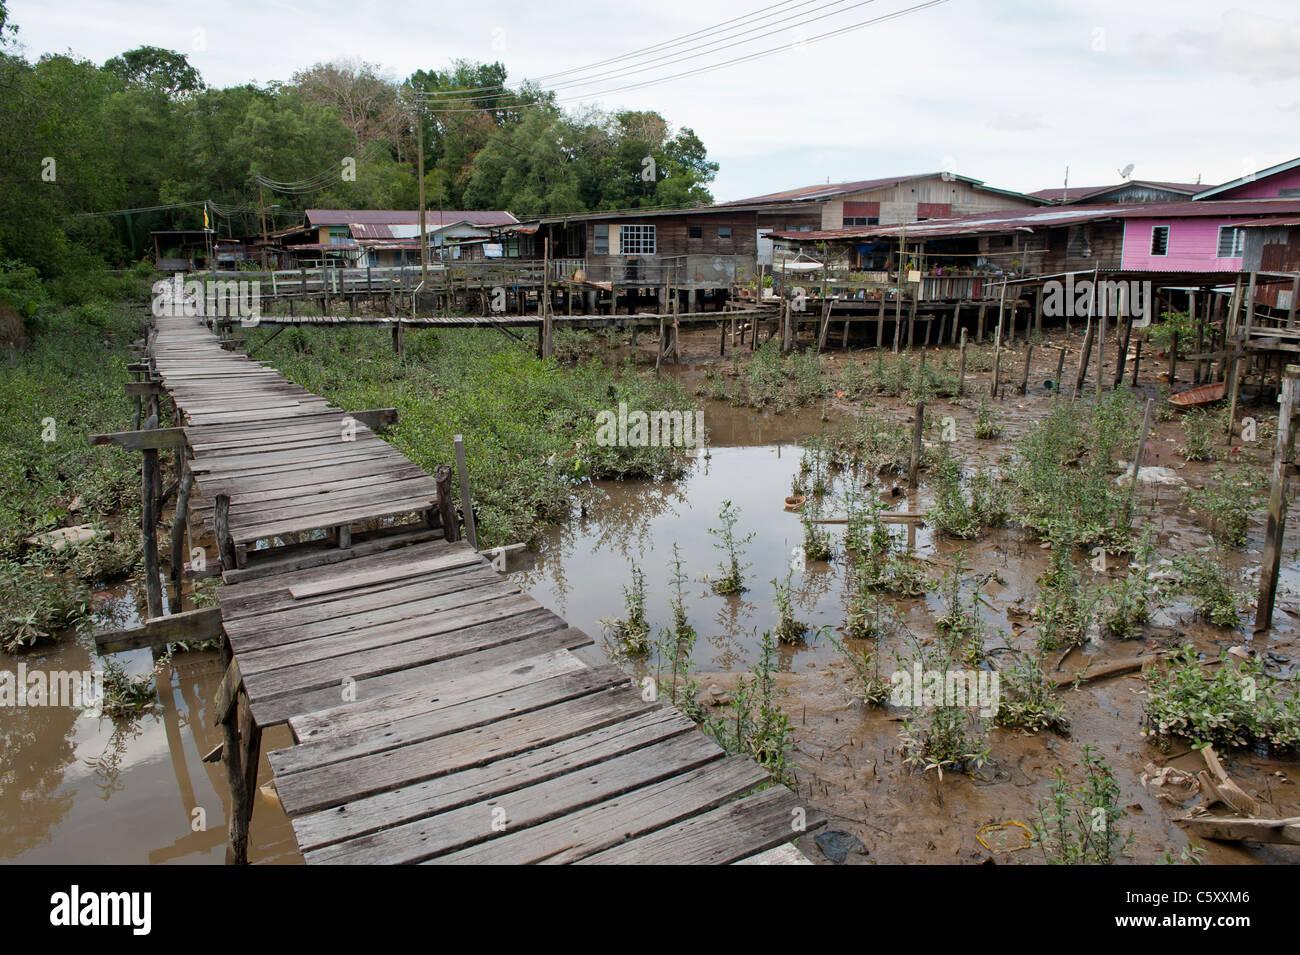 Rickety Walkway in Kampong Ayer Water Village in Bandar Seri Begawan, Brunei - Stock Image